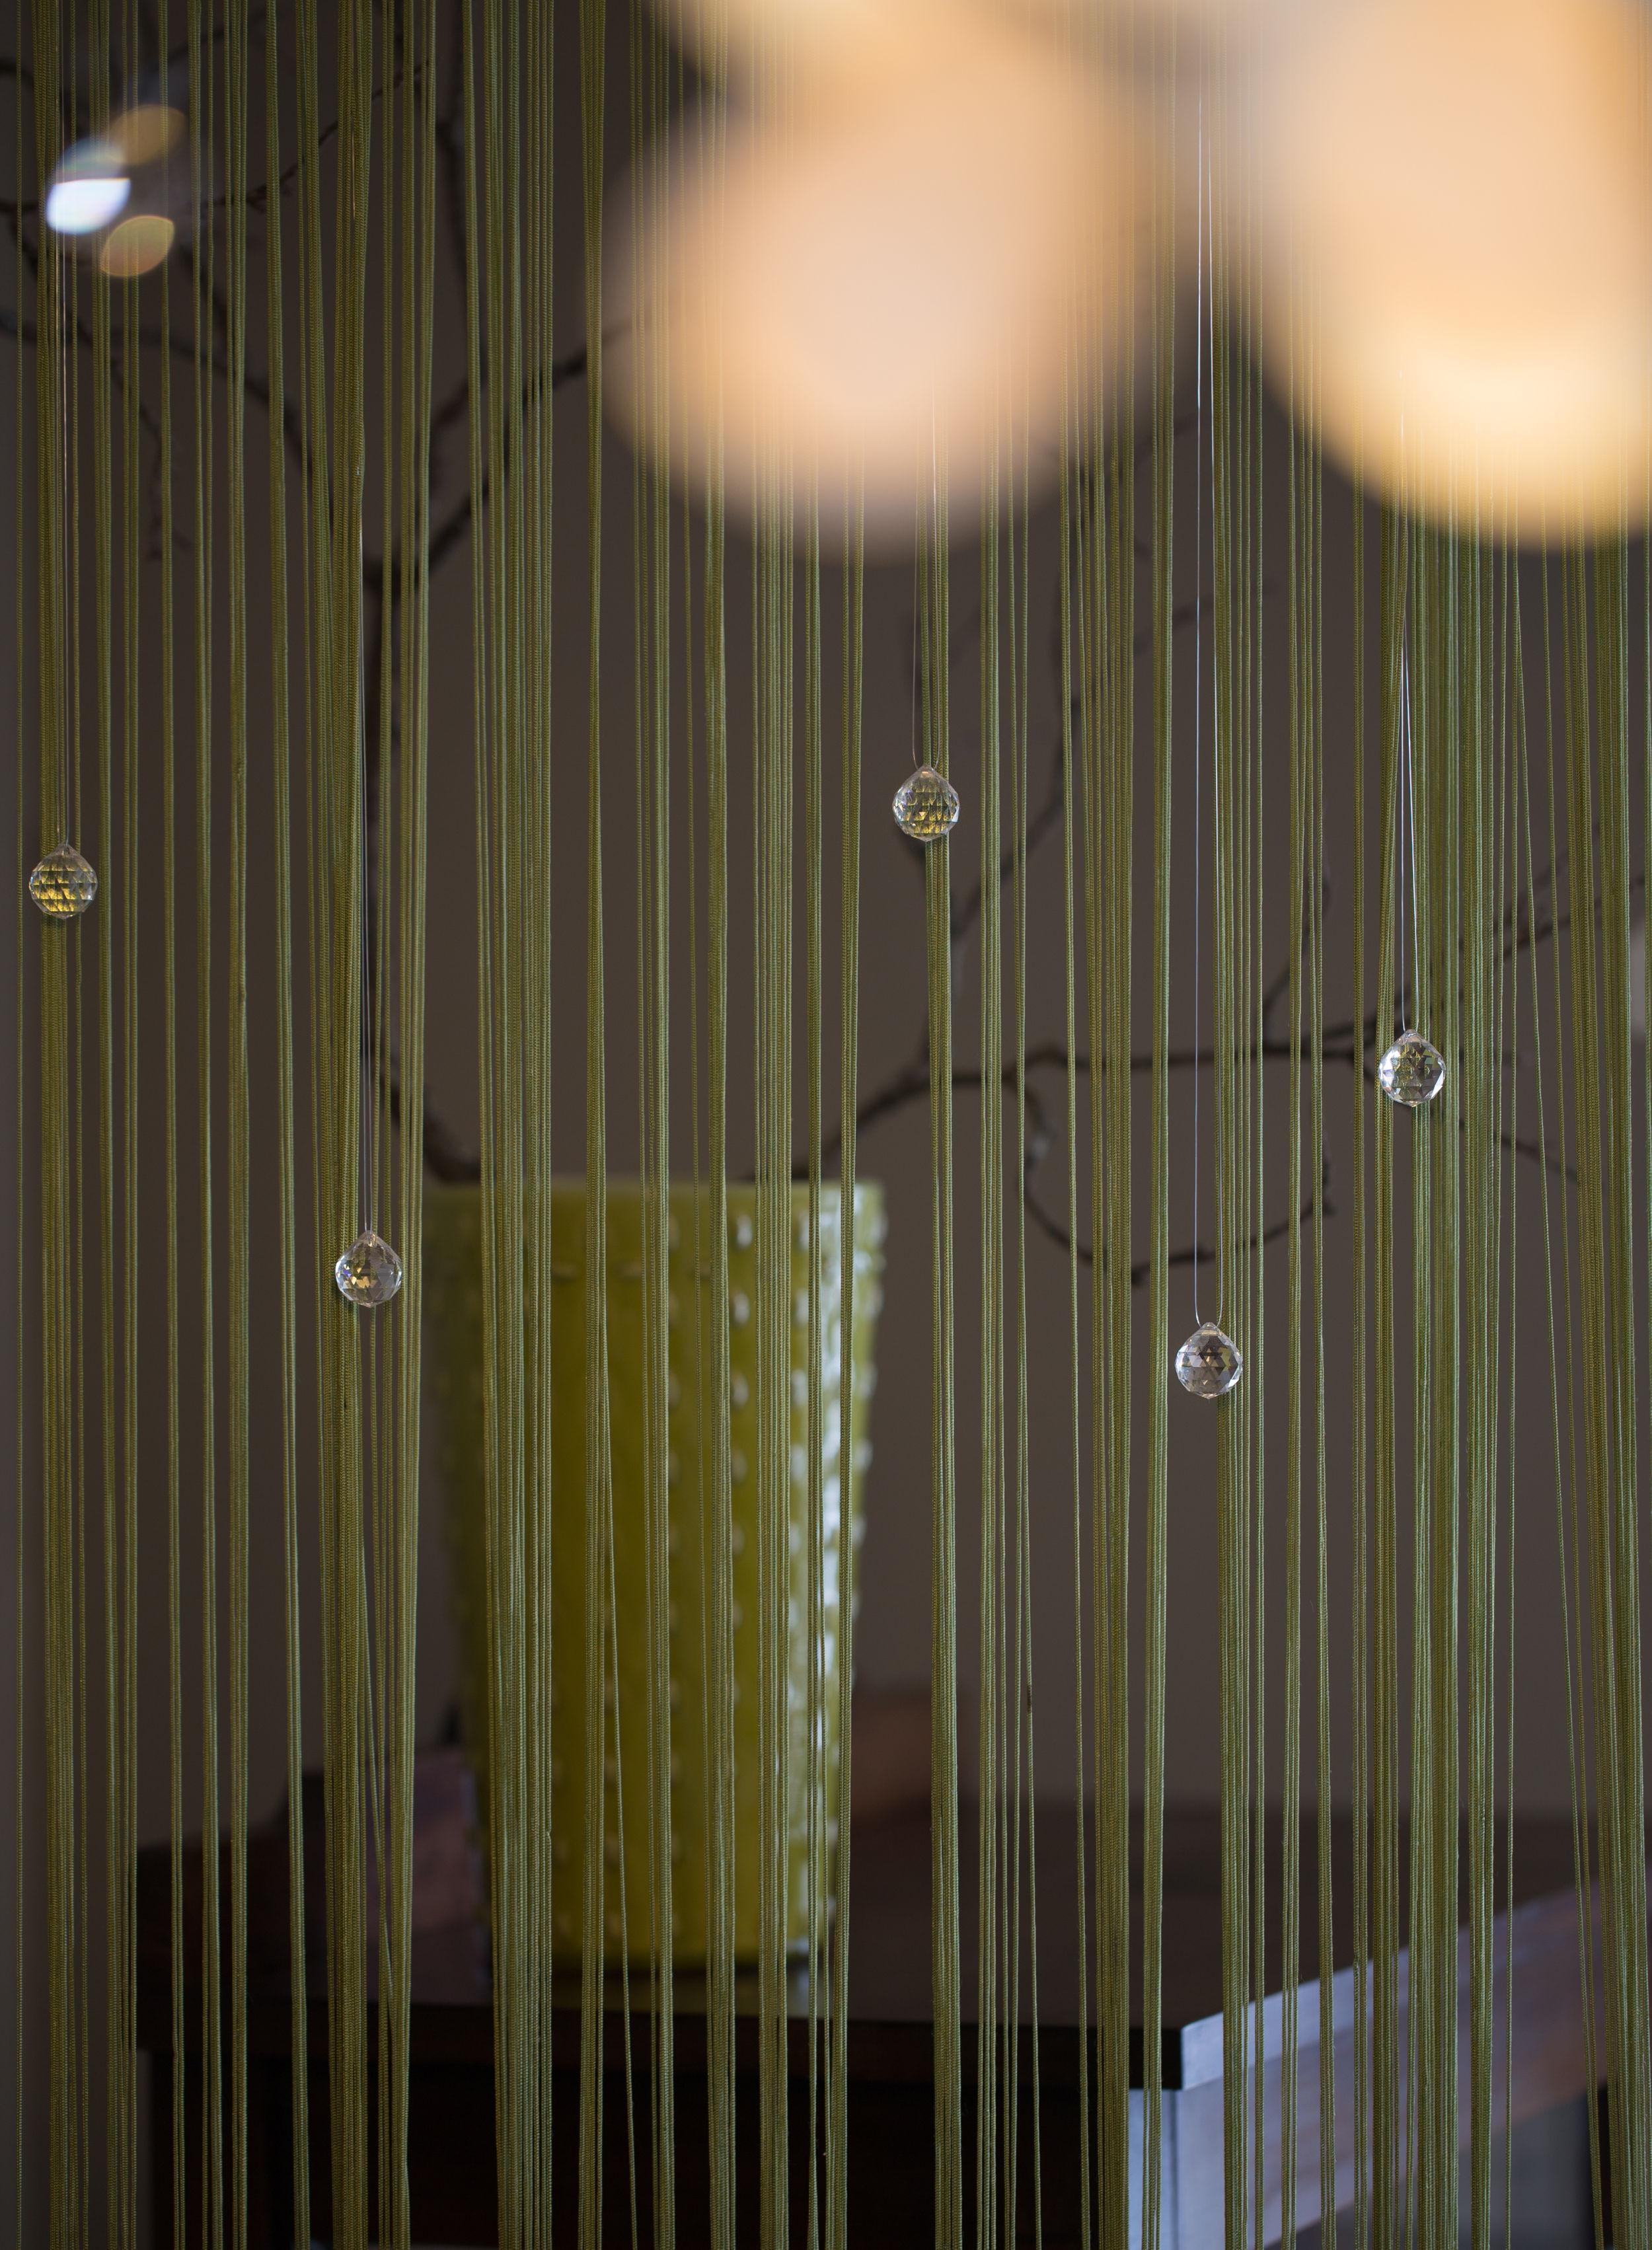 curtaincrystals.jpg